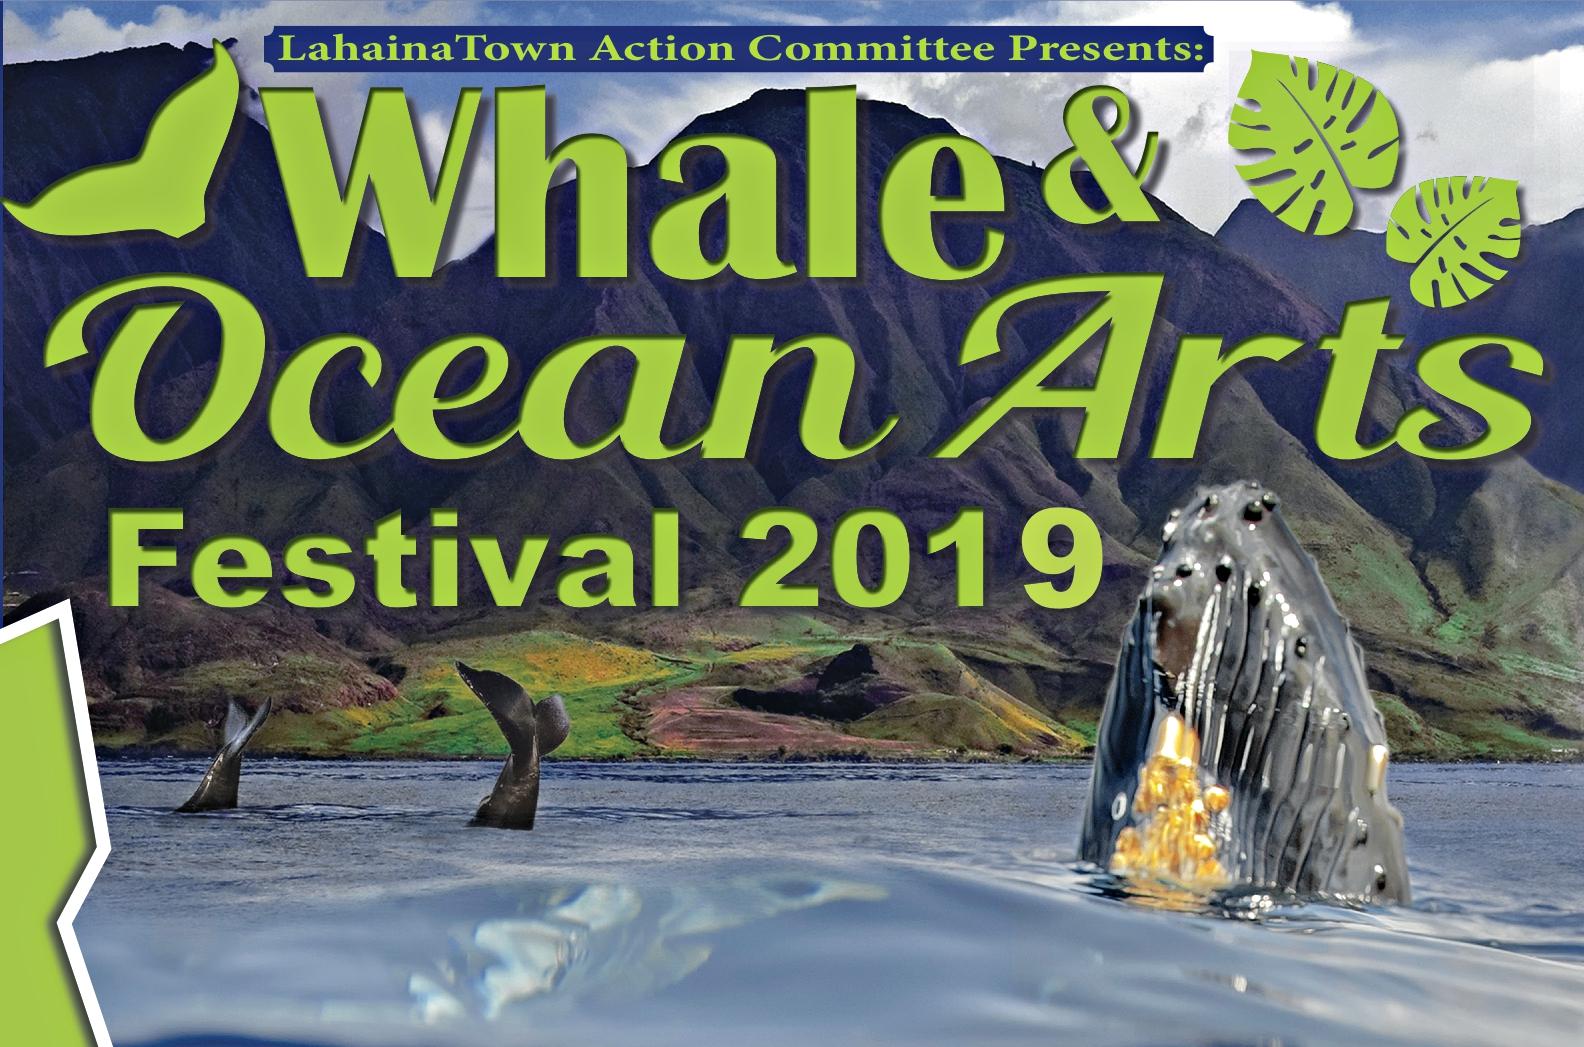 Free Whale & Ocean Arts Festival 2019, March 9